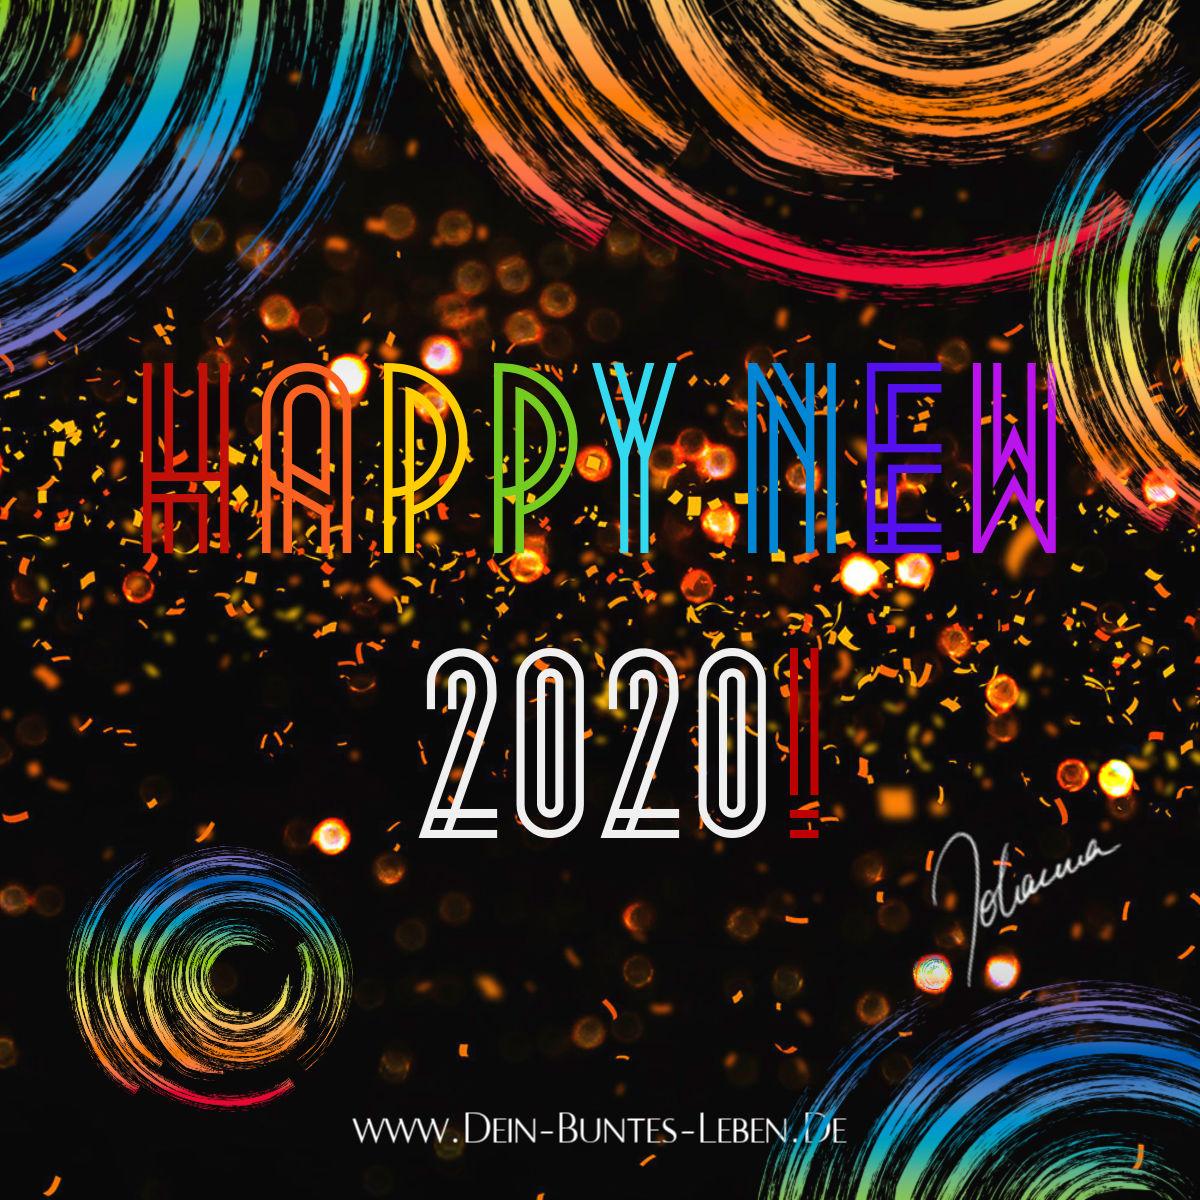 Frohes Jahr 2020! Happy new 2020! ©2020 Johanna Ringe www.dein-buntes-leben.de